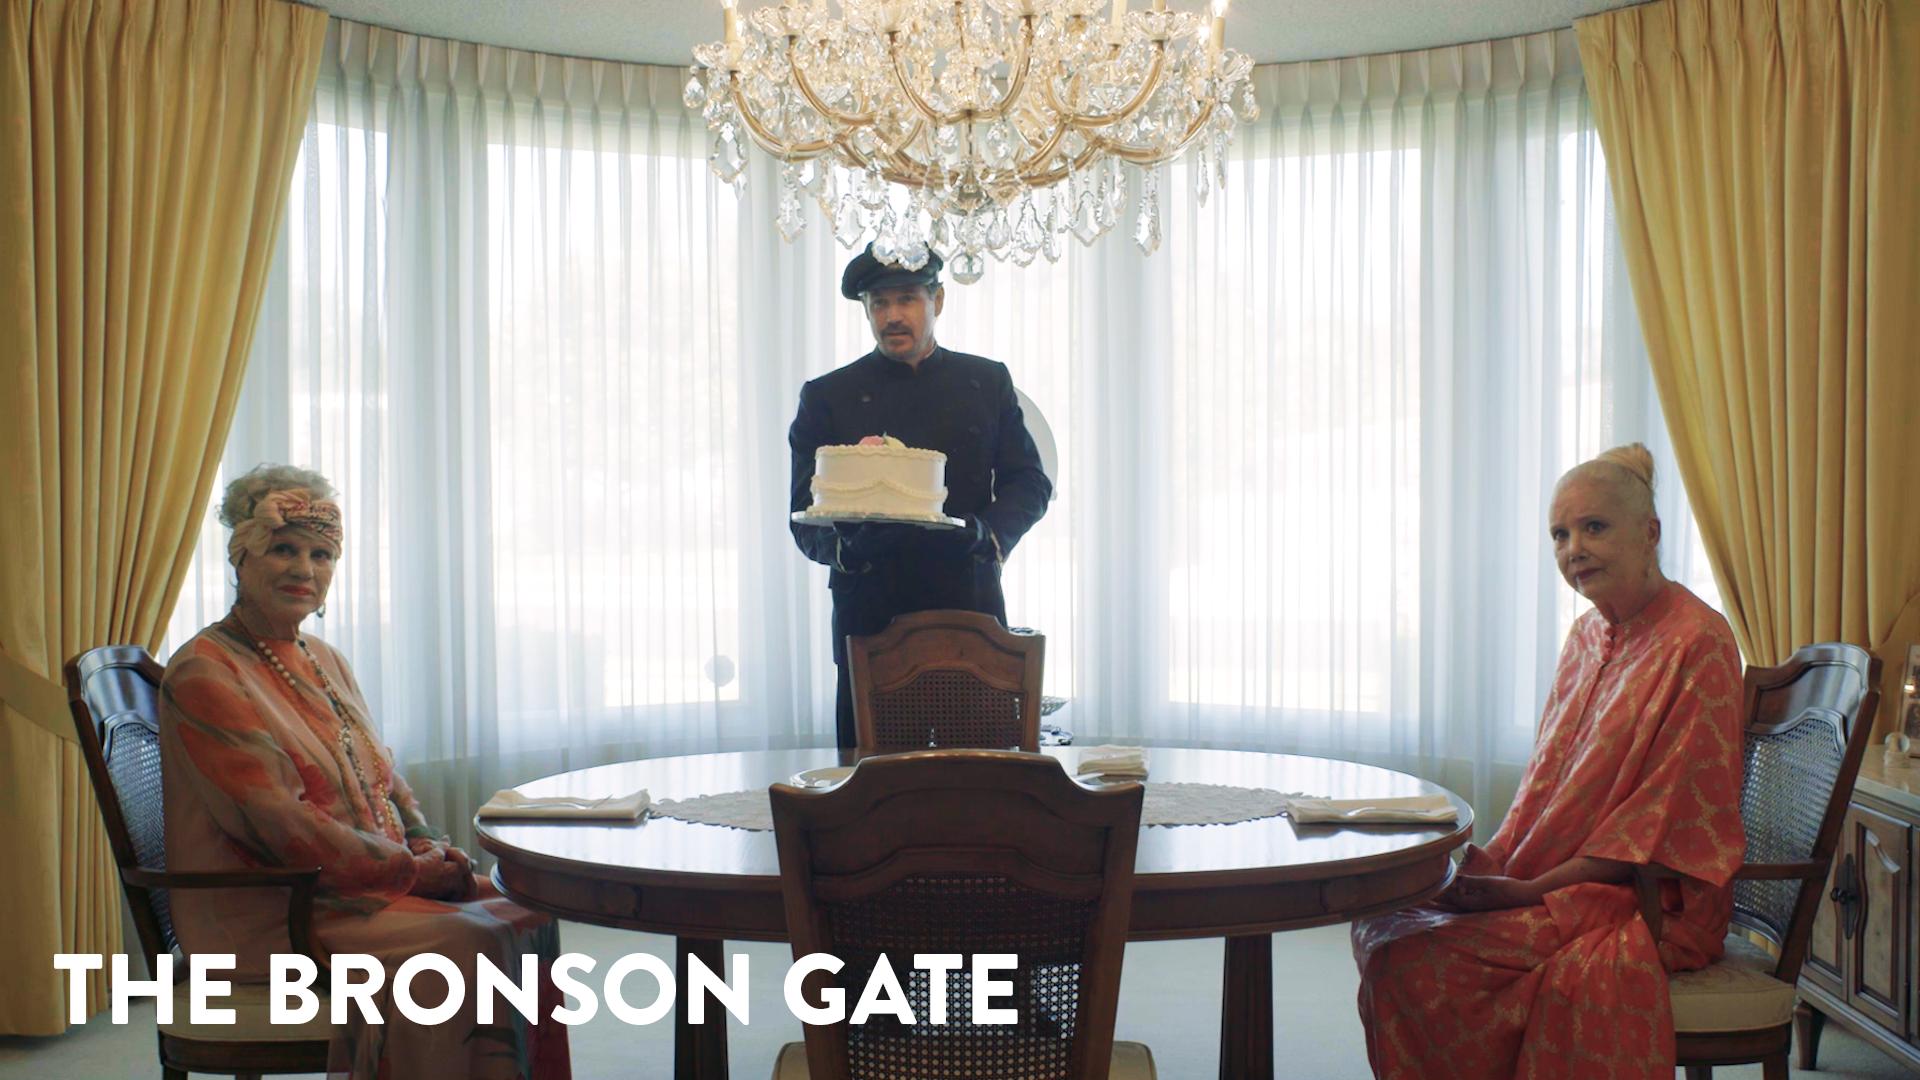 The Bronson Gate